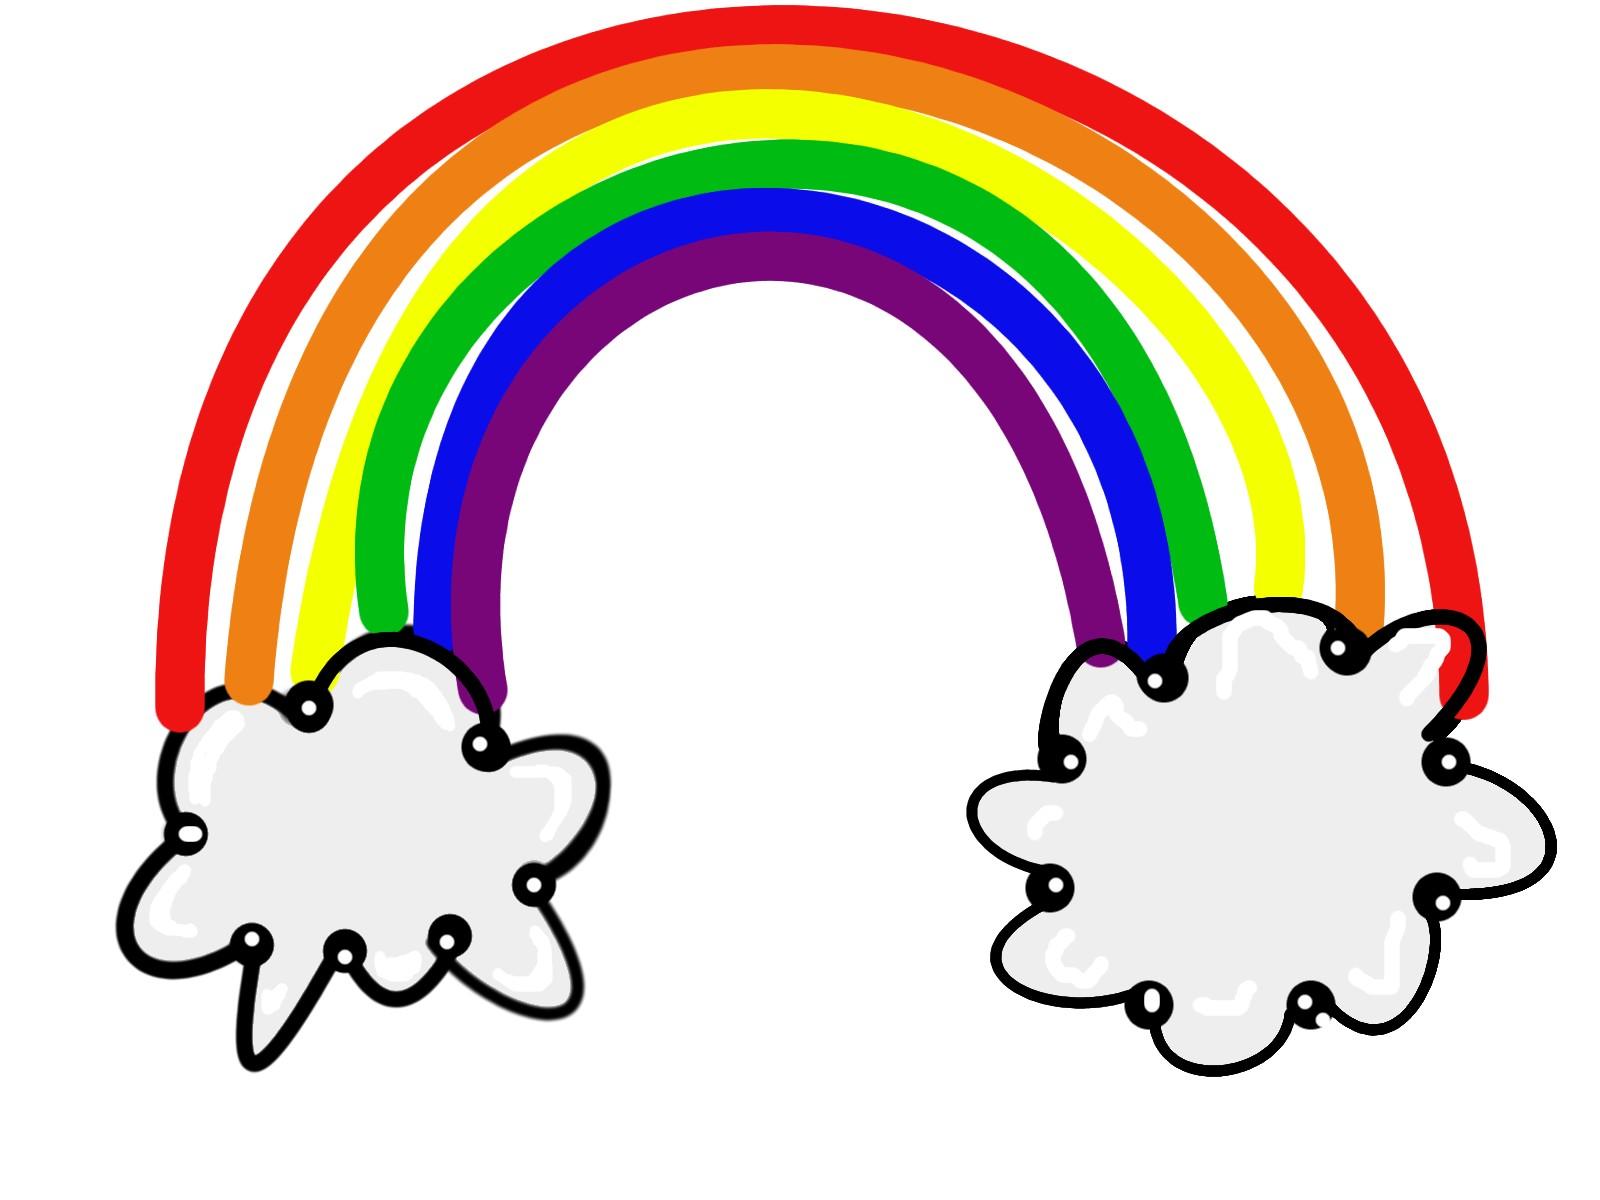 Free Rainbow Clip Art, Download Free Clip Art, Free Clip Art.